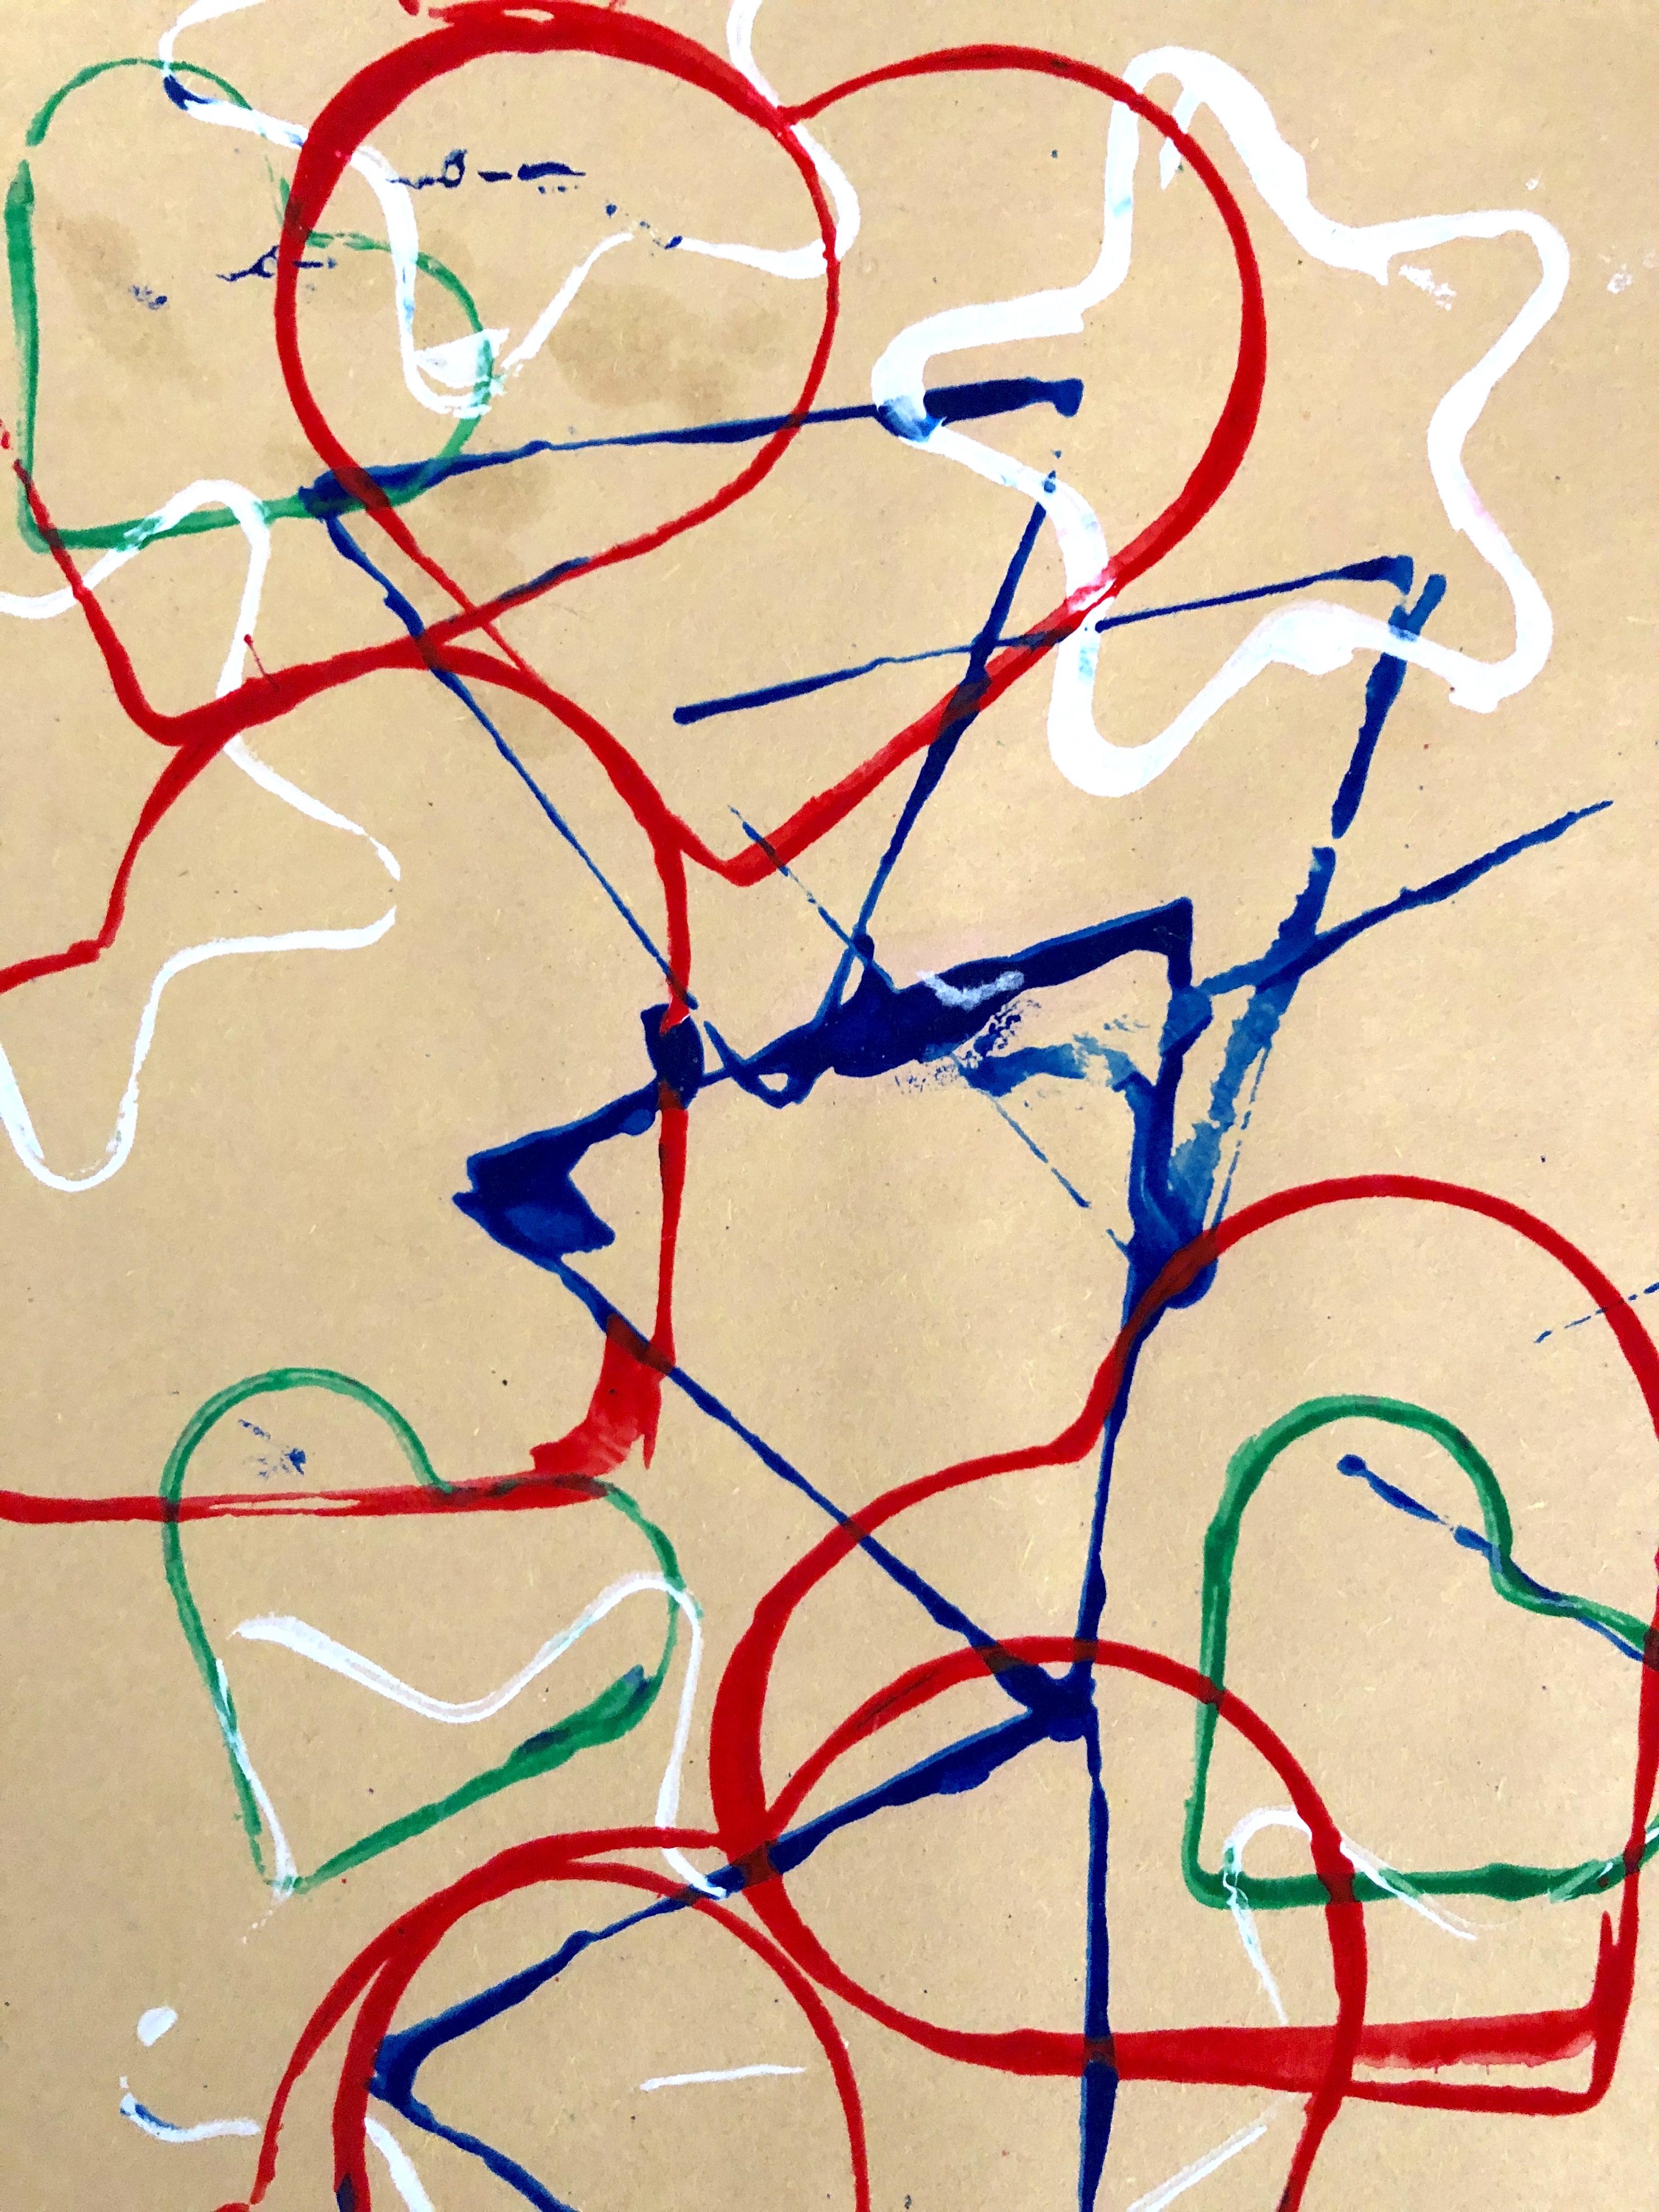 Pre-writing Activities for Preschoolers & Kindergarten & toddlers. Pre writing activity for toddlers. print making